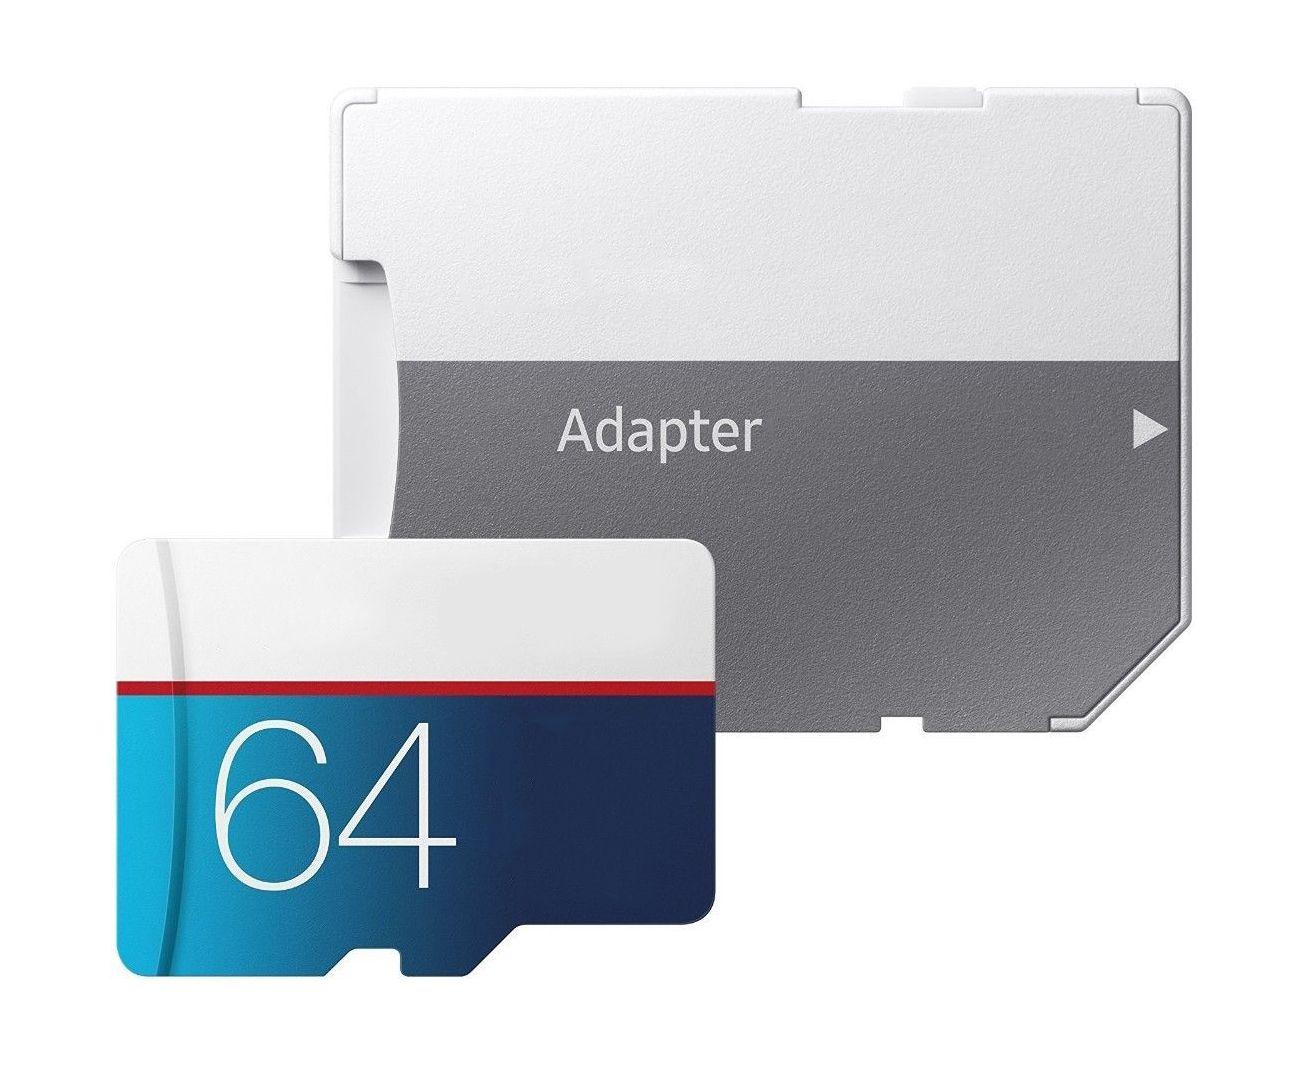 PRO 선택 UHS-I 128GB 64GB 32GB 16GB 클래스 10 U3 메모리 TF 카드 어댑터가 빠른 속도로